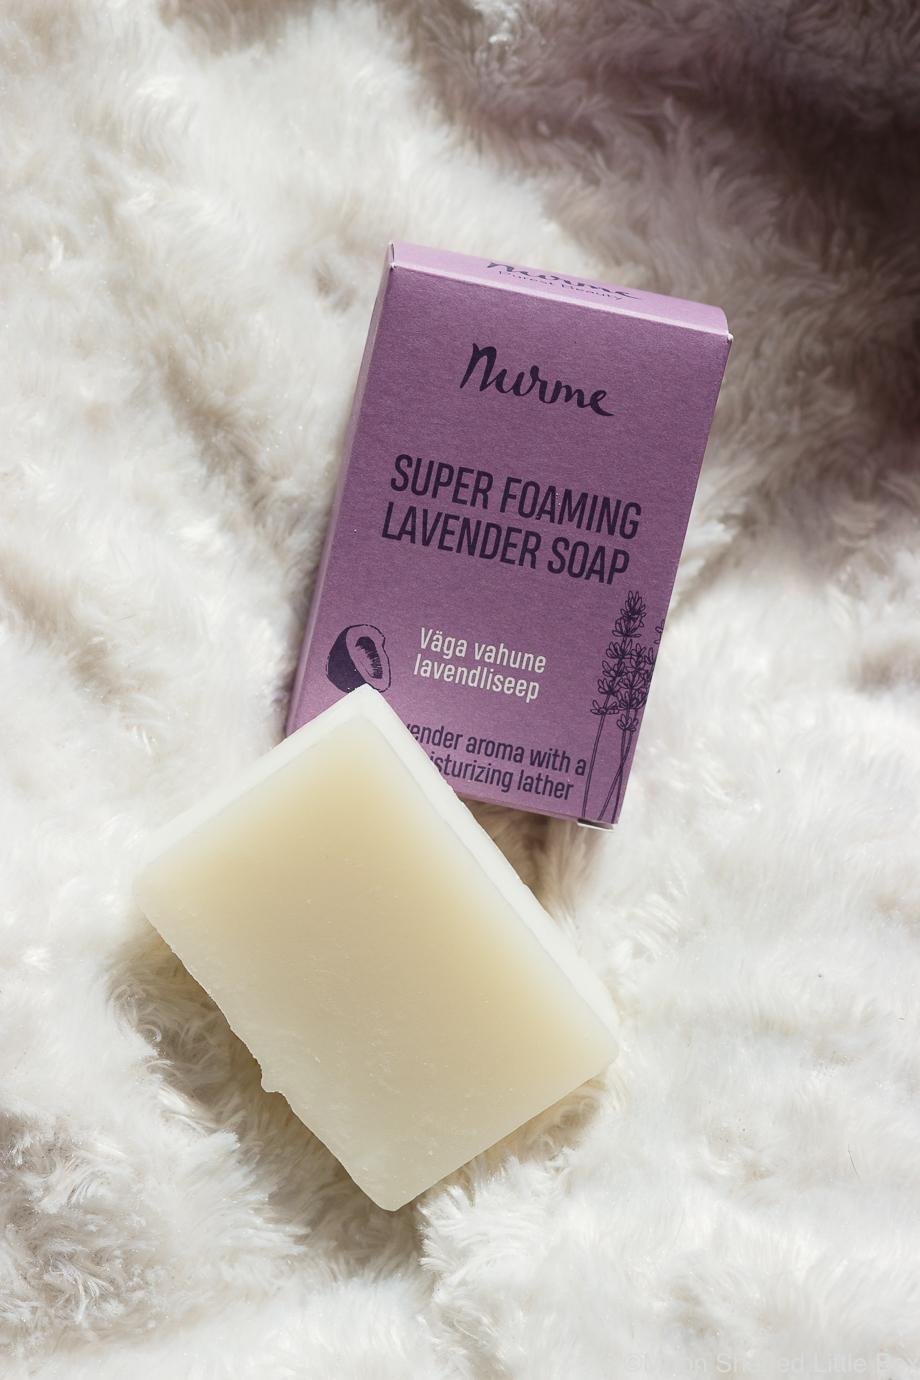 Nurme-palasaippua-vartalolle-Super-Foaming-Lavender-Soap-2